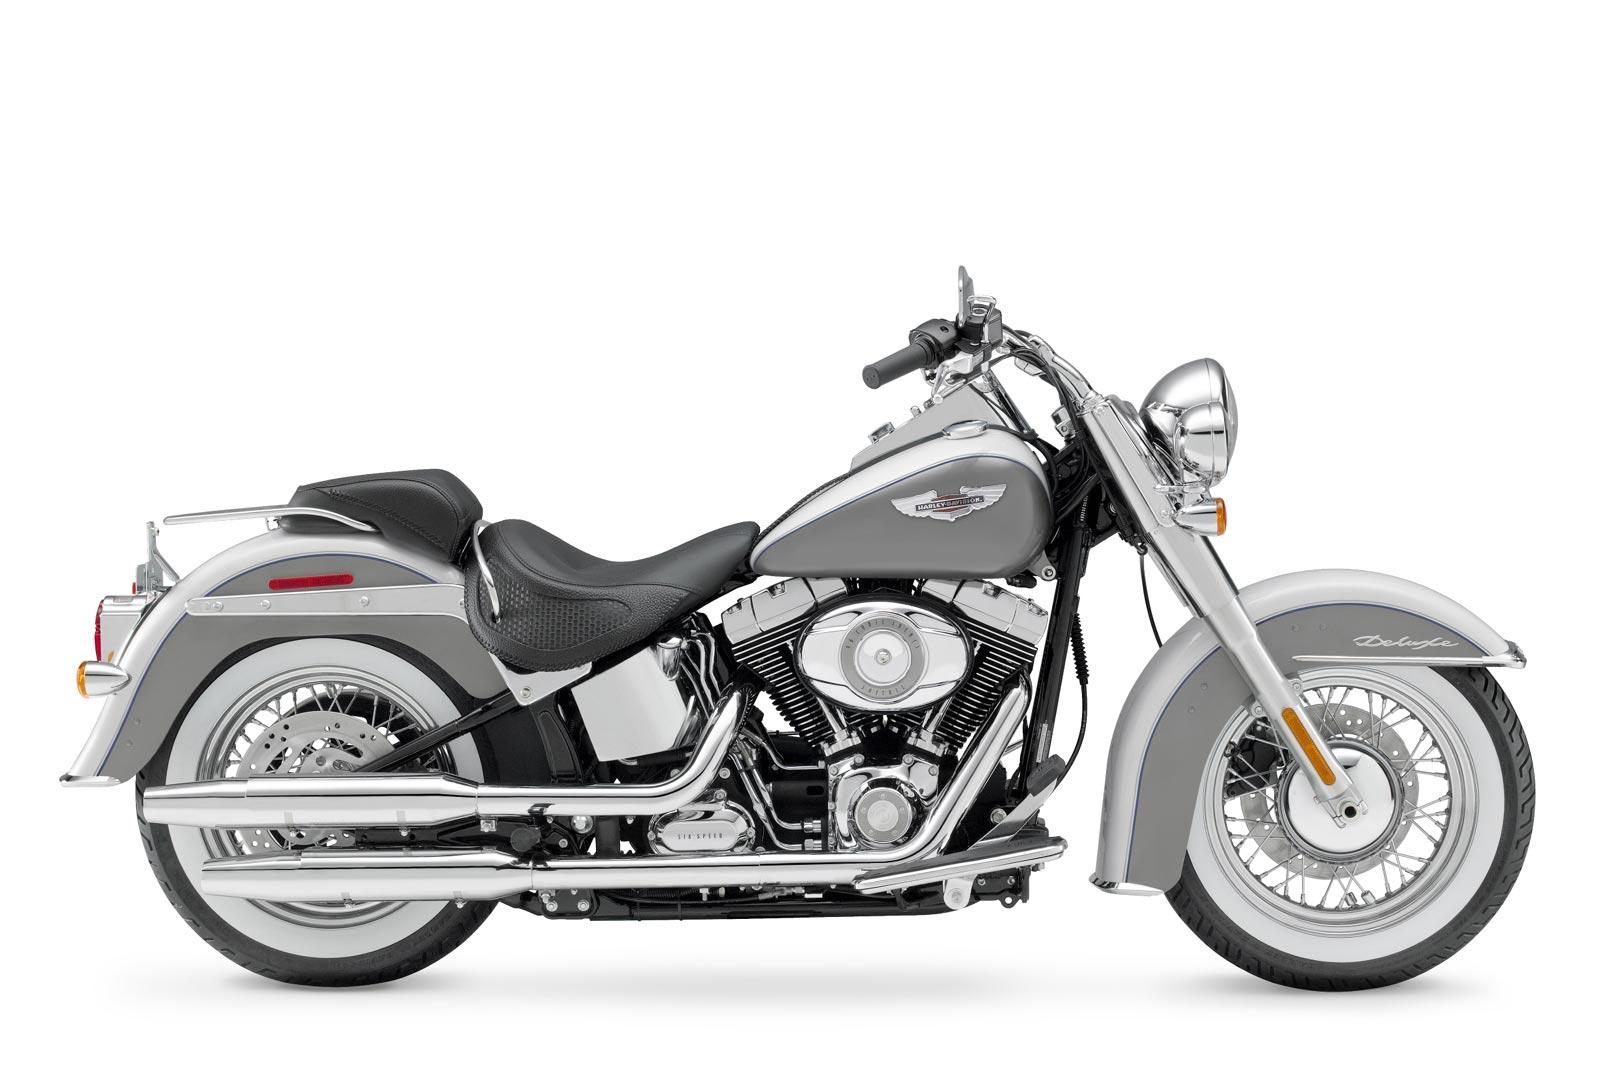 Harley Davidson Softail Deluxe Specs 2007 2008